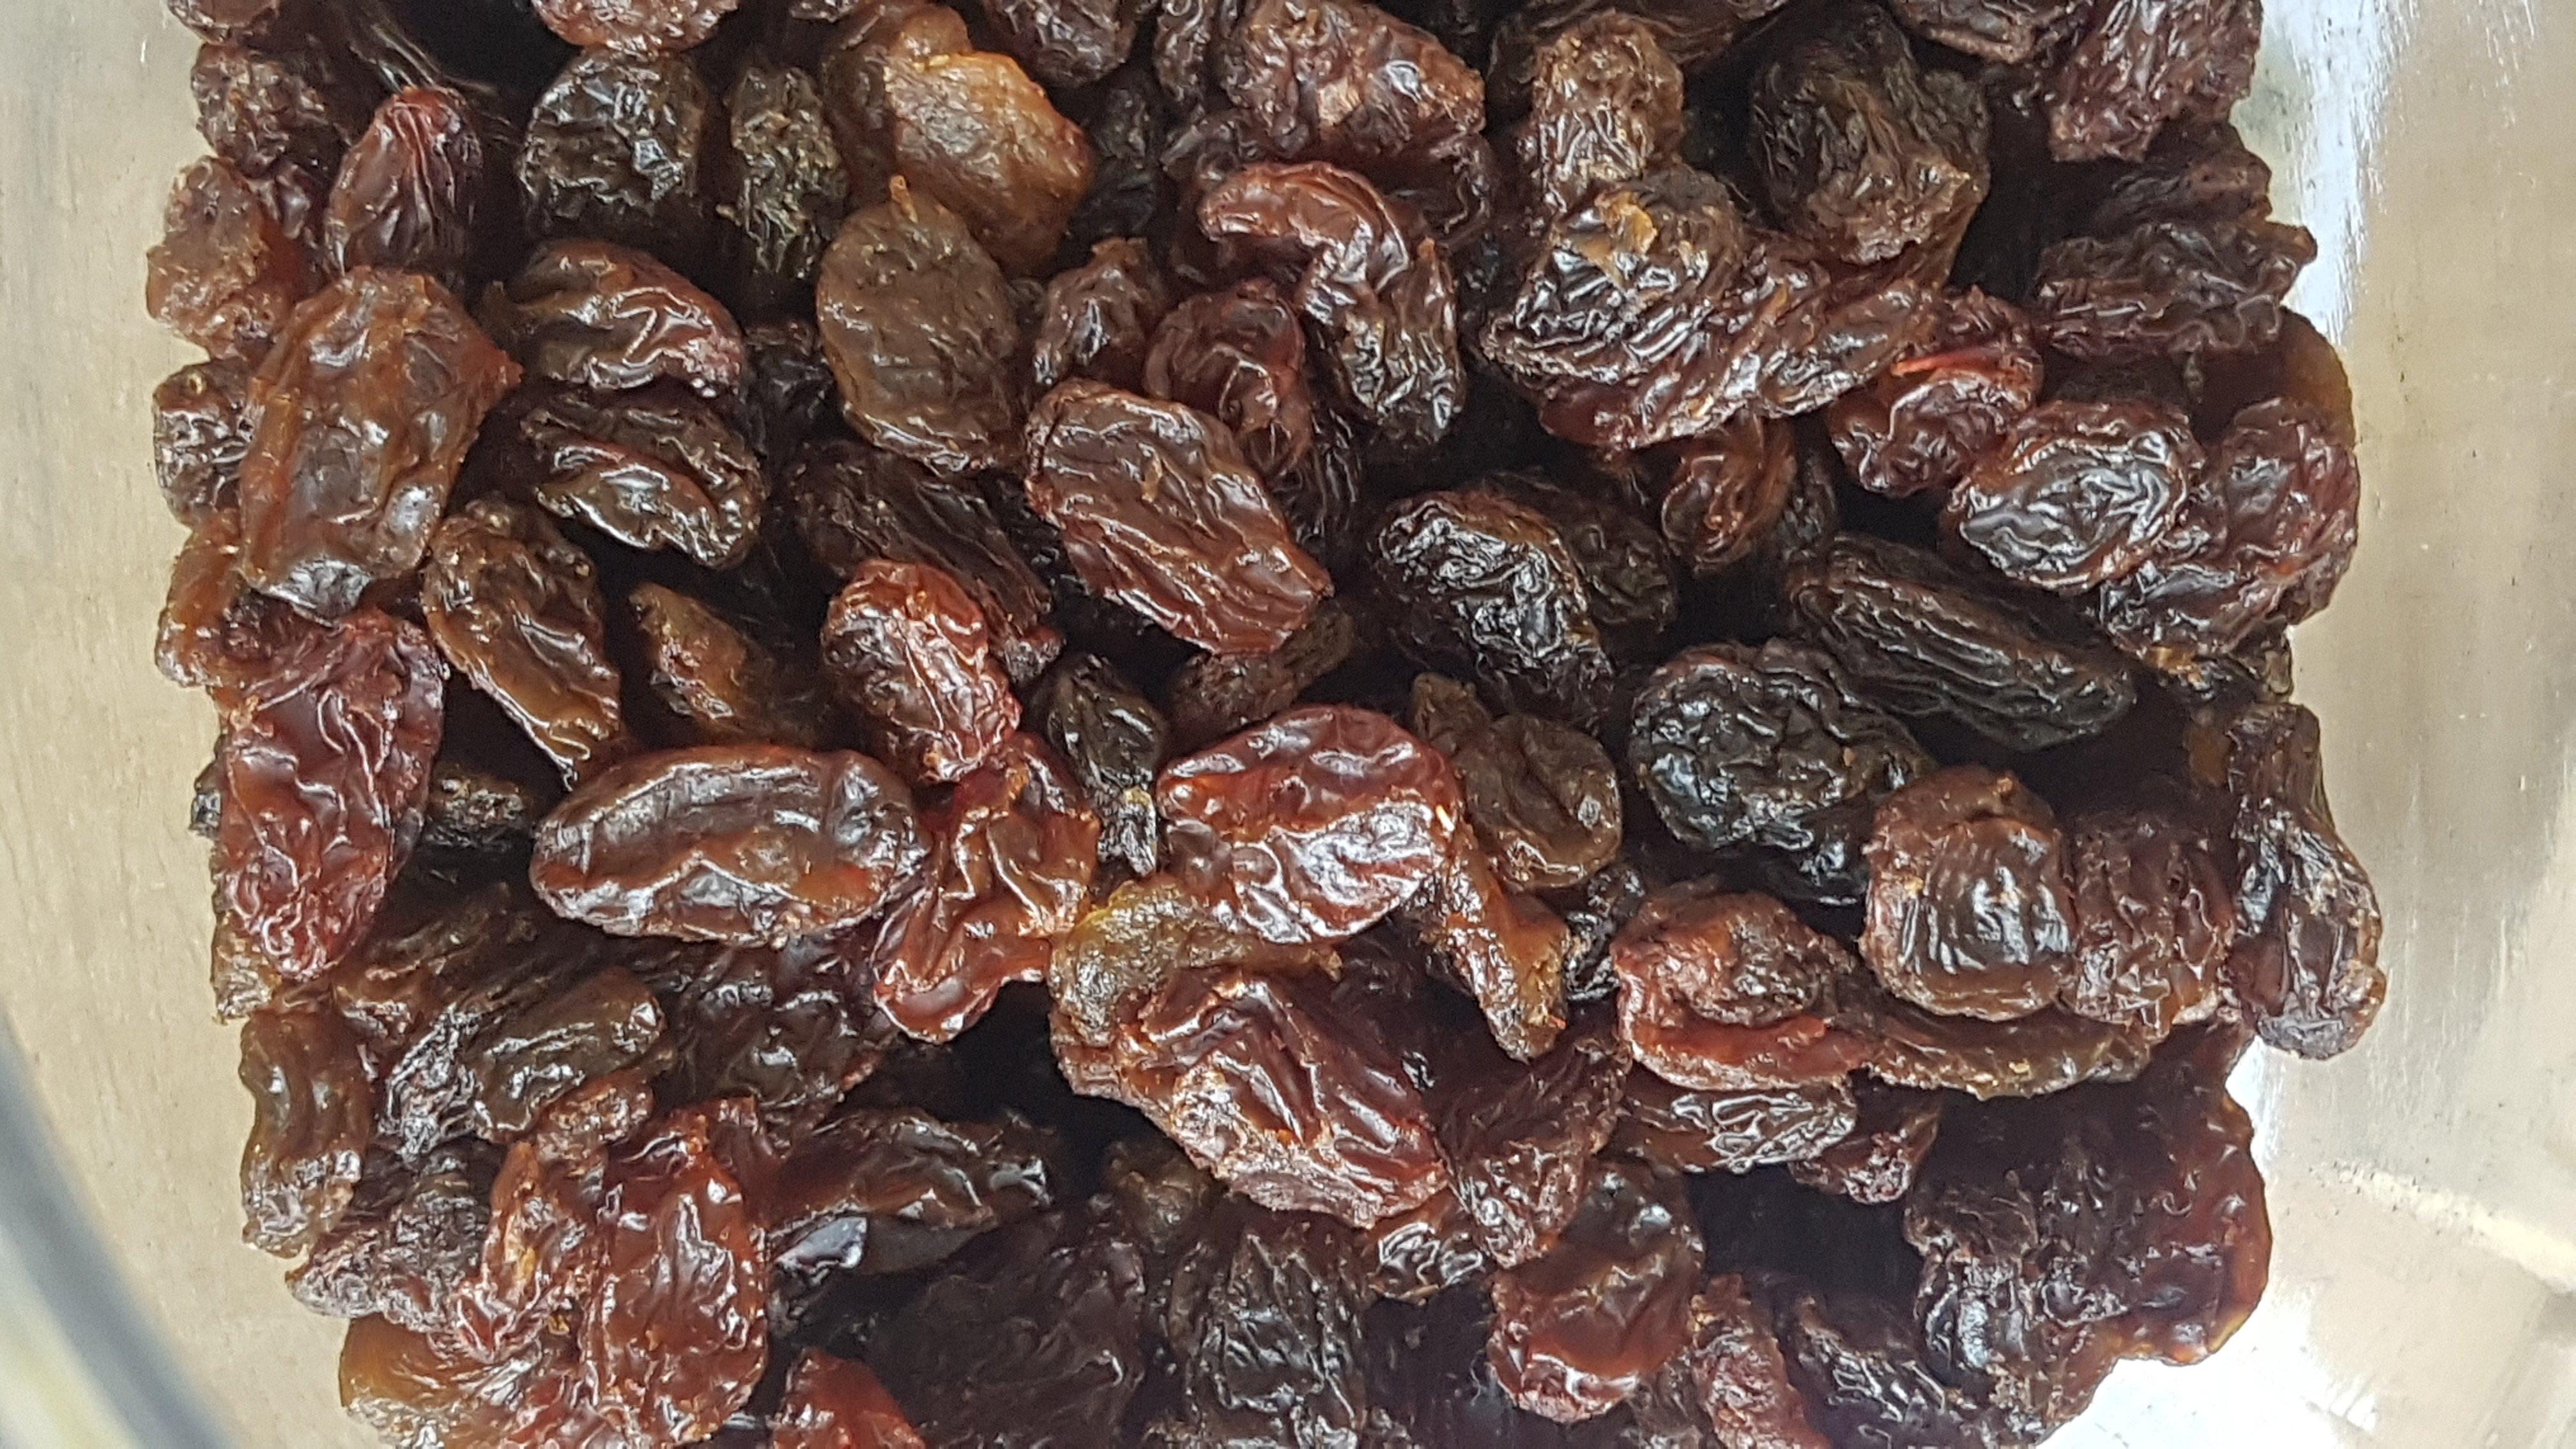 Raisins Organic - per 100g